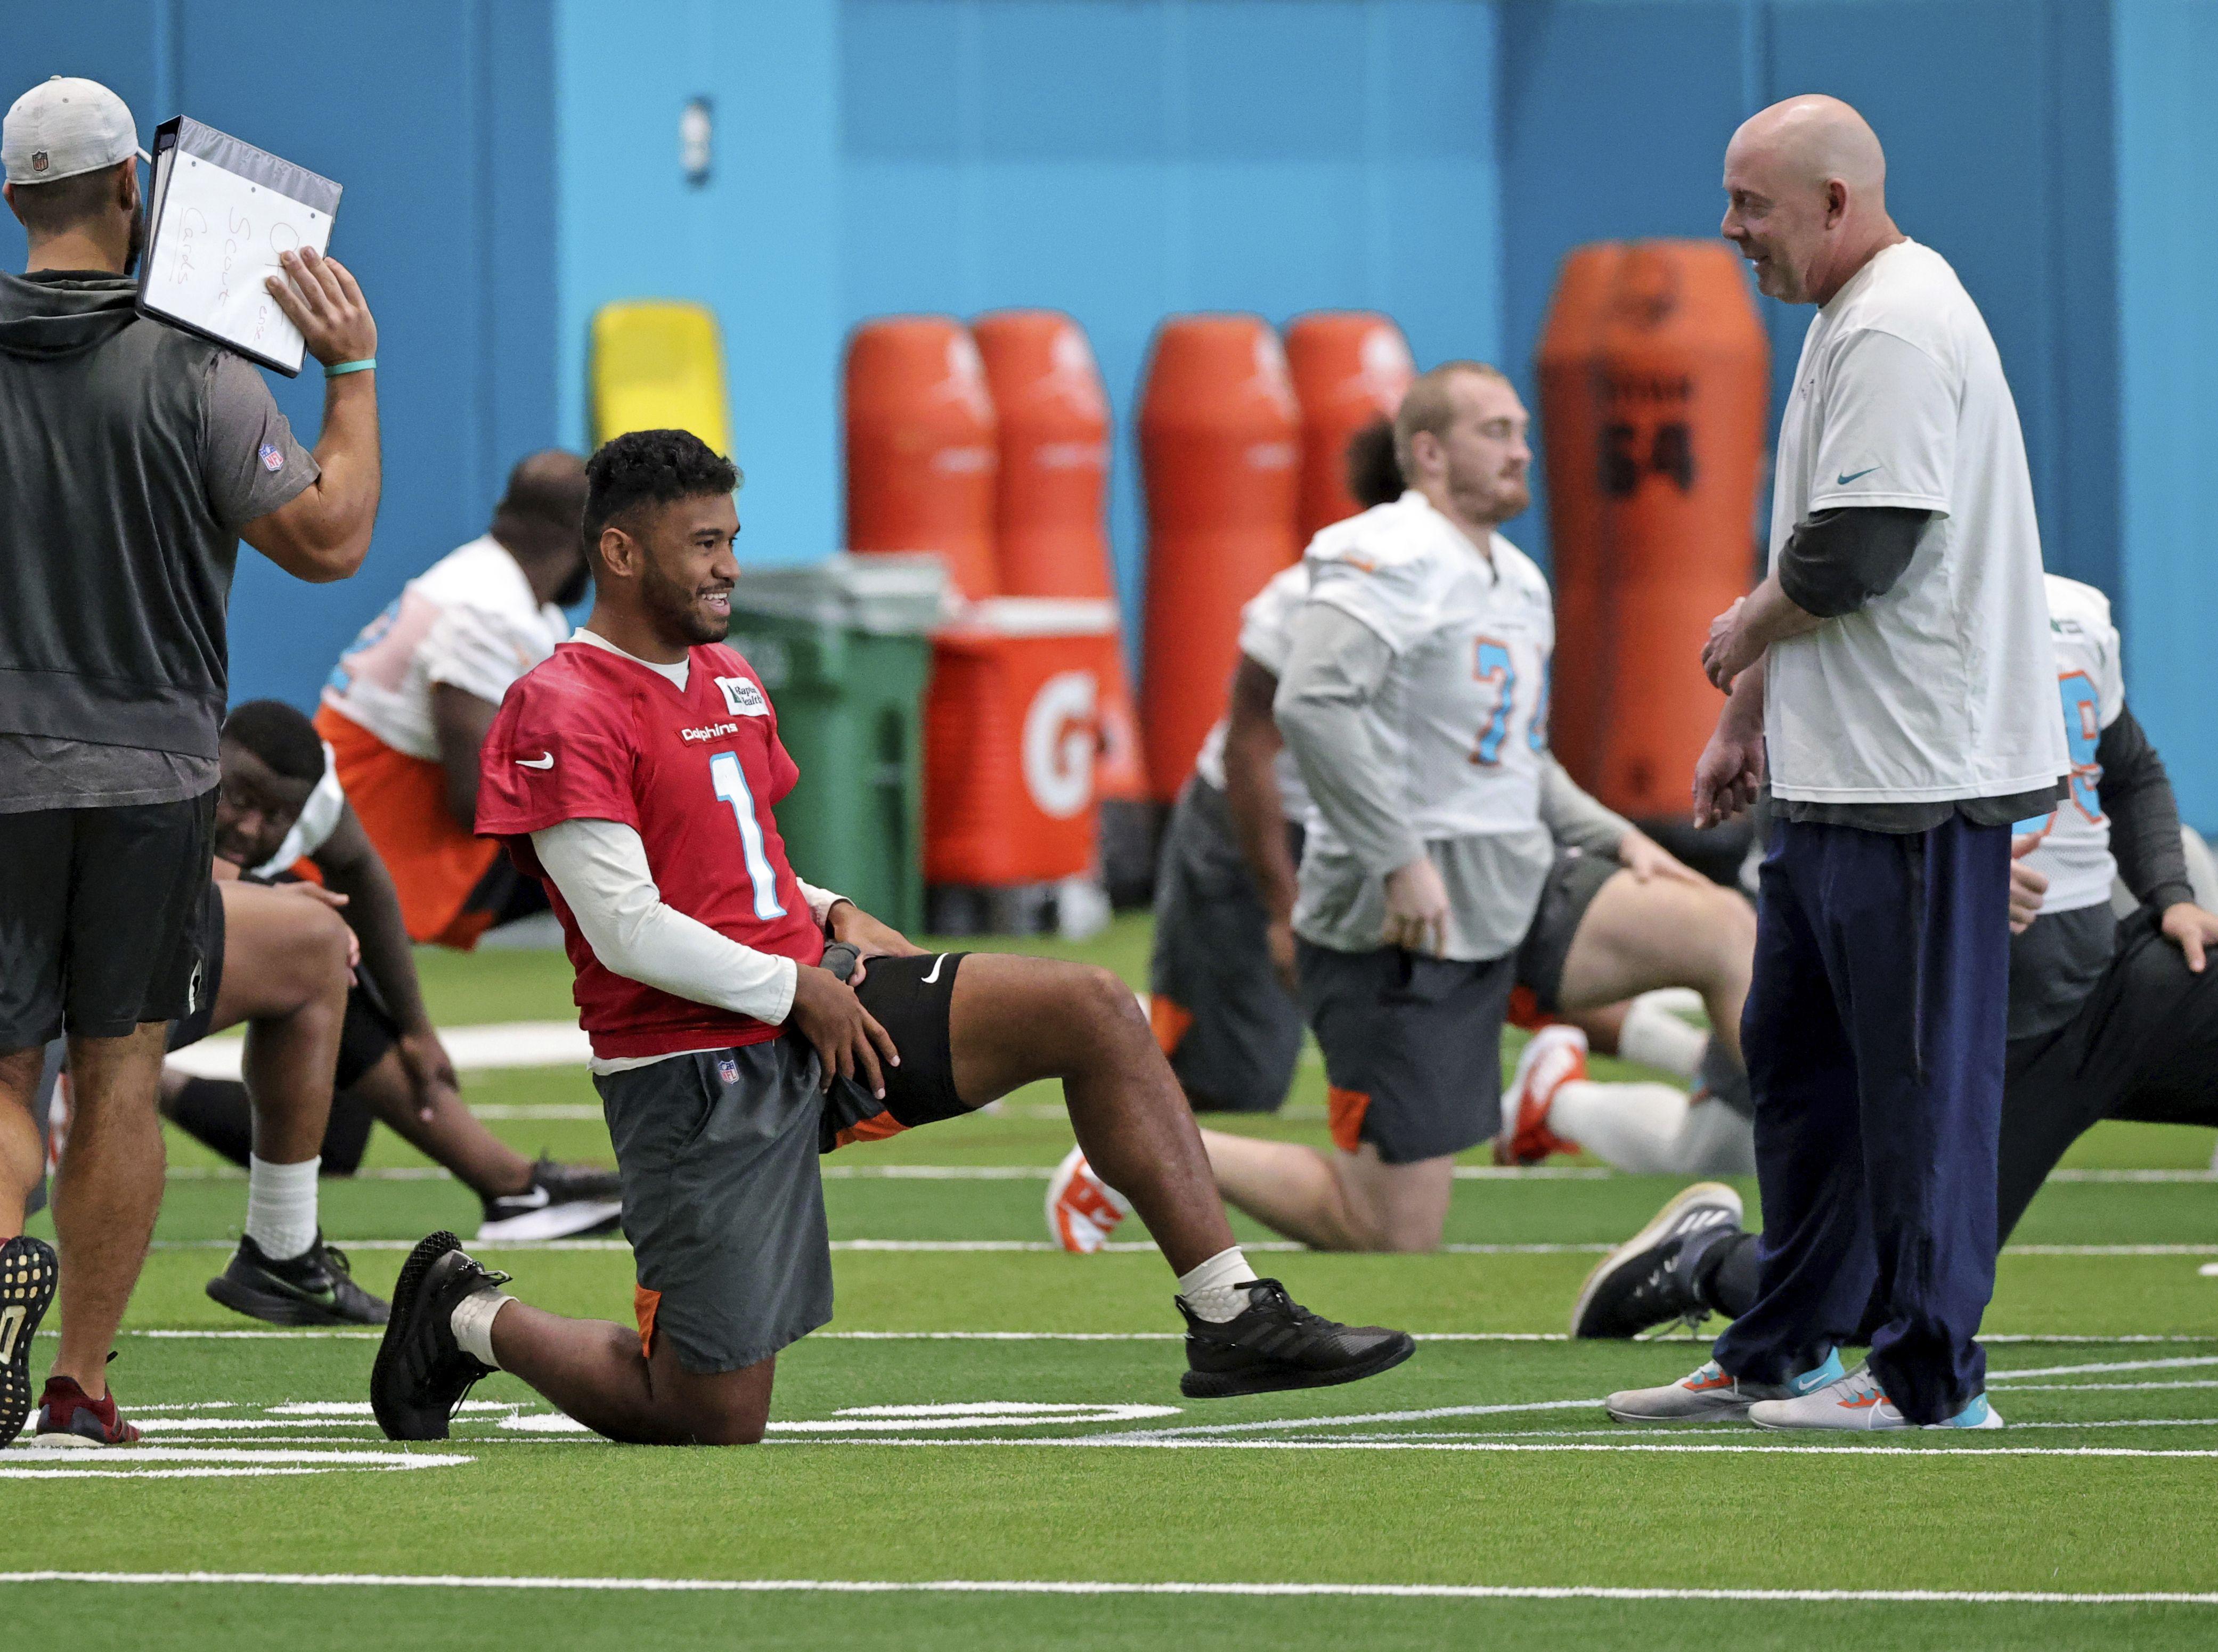 dolphins ratifican su confianza en quarterback tagovailoa